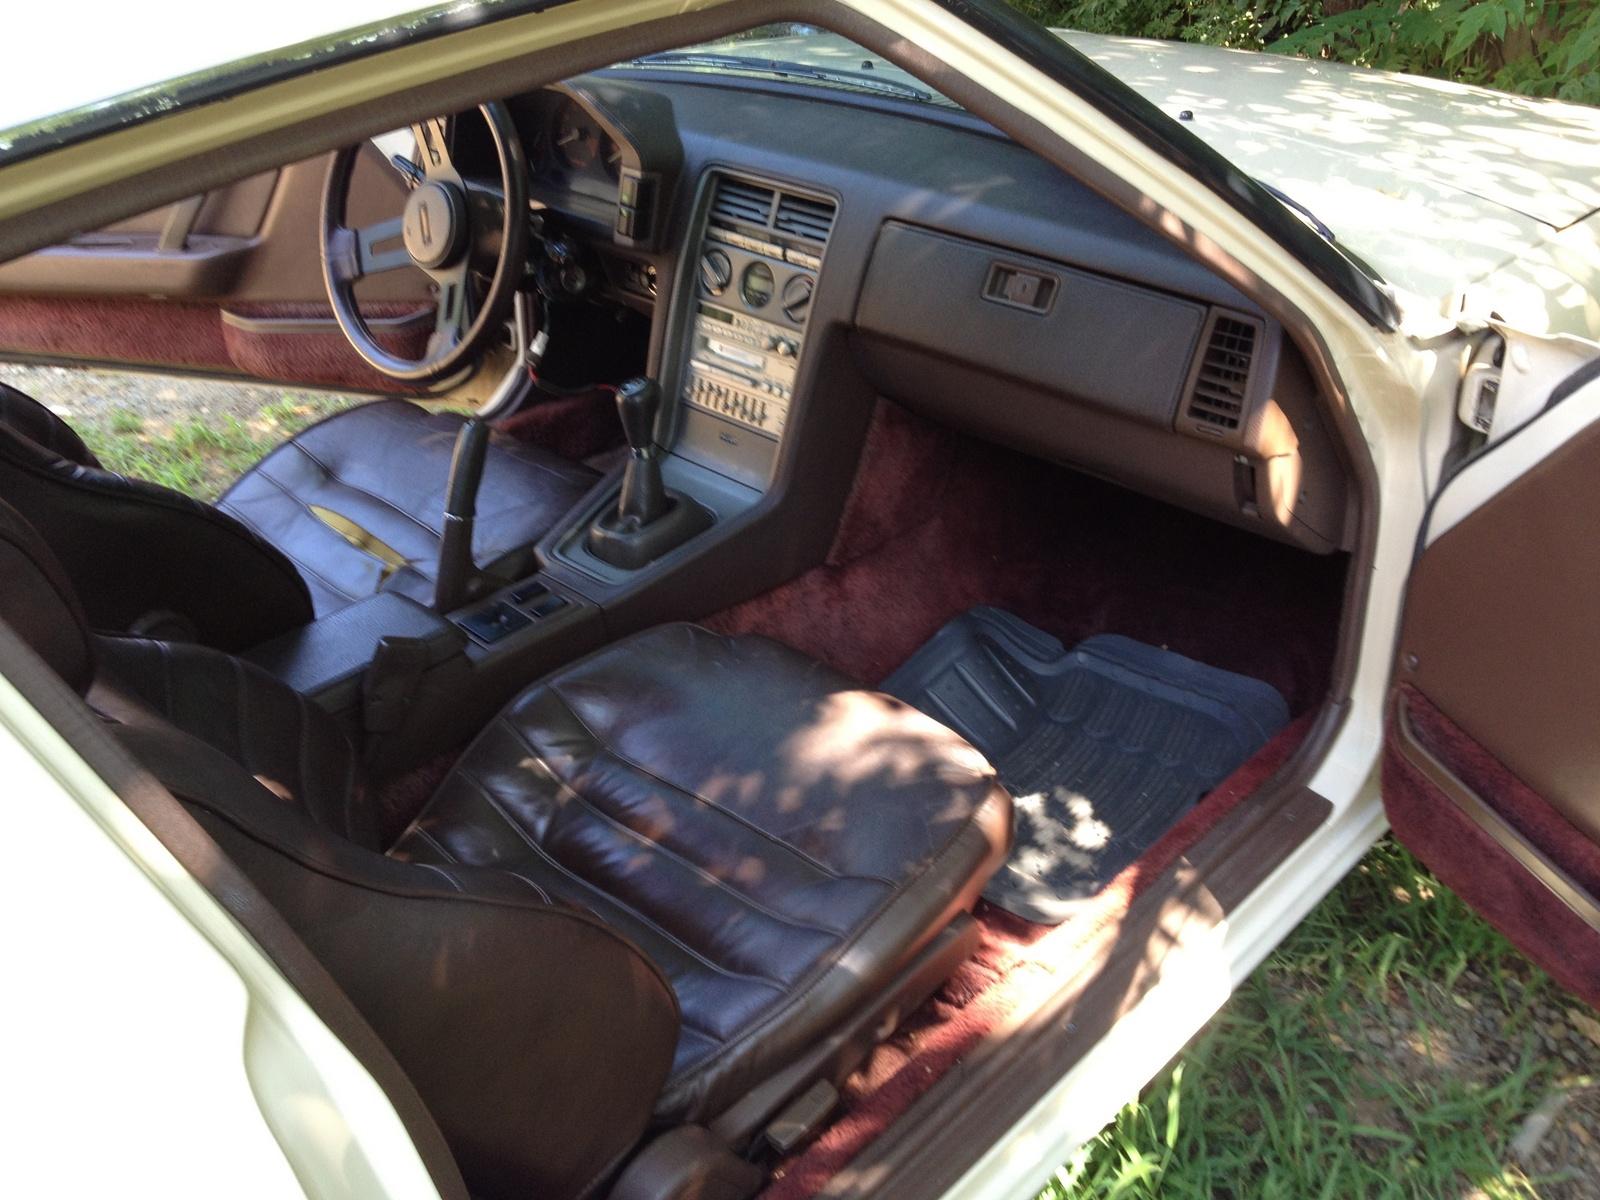 1984 Mazda Rx-7 - Interior Pictures